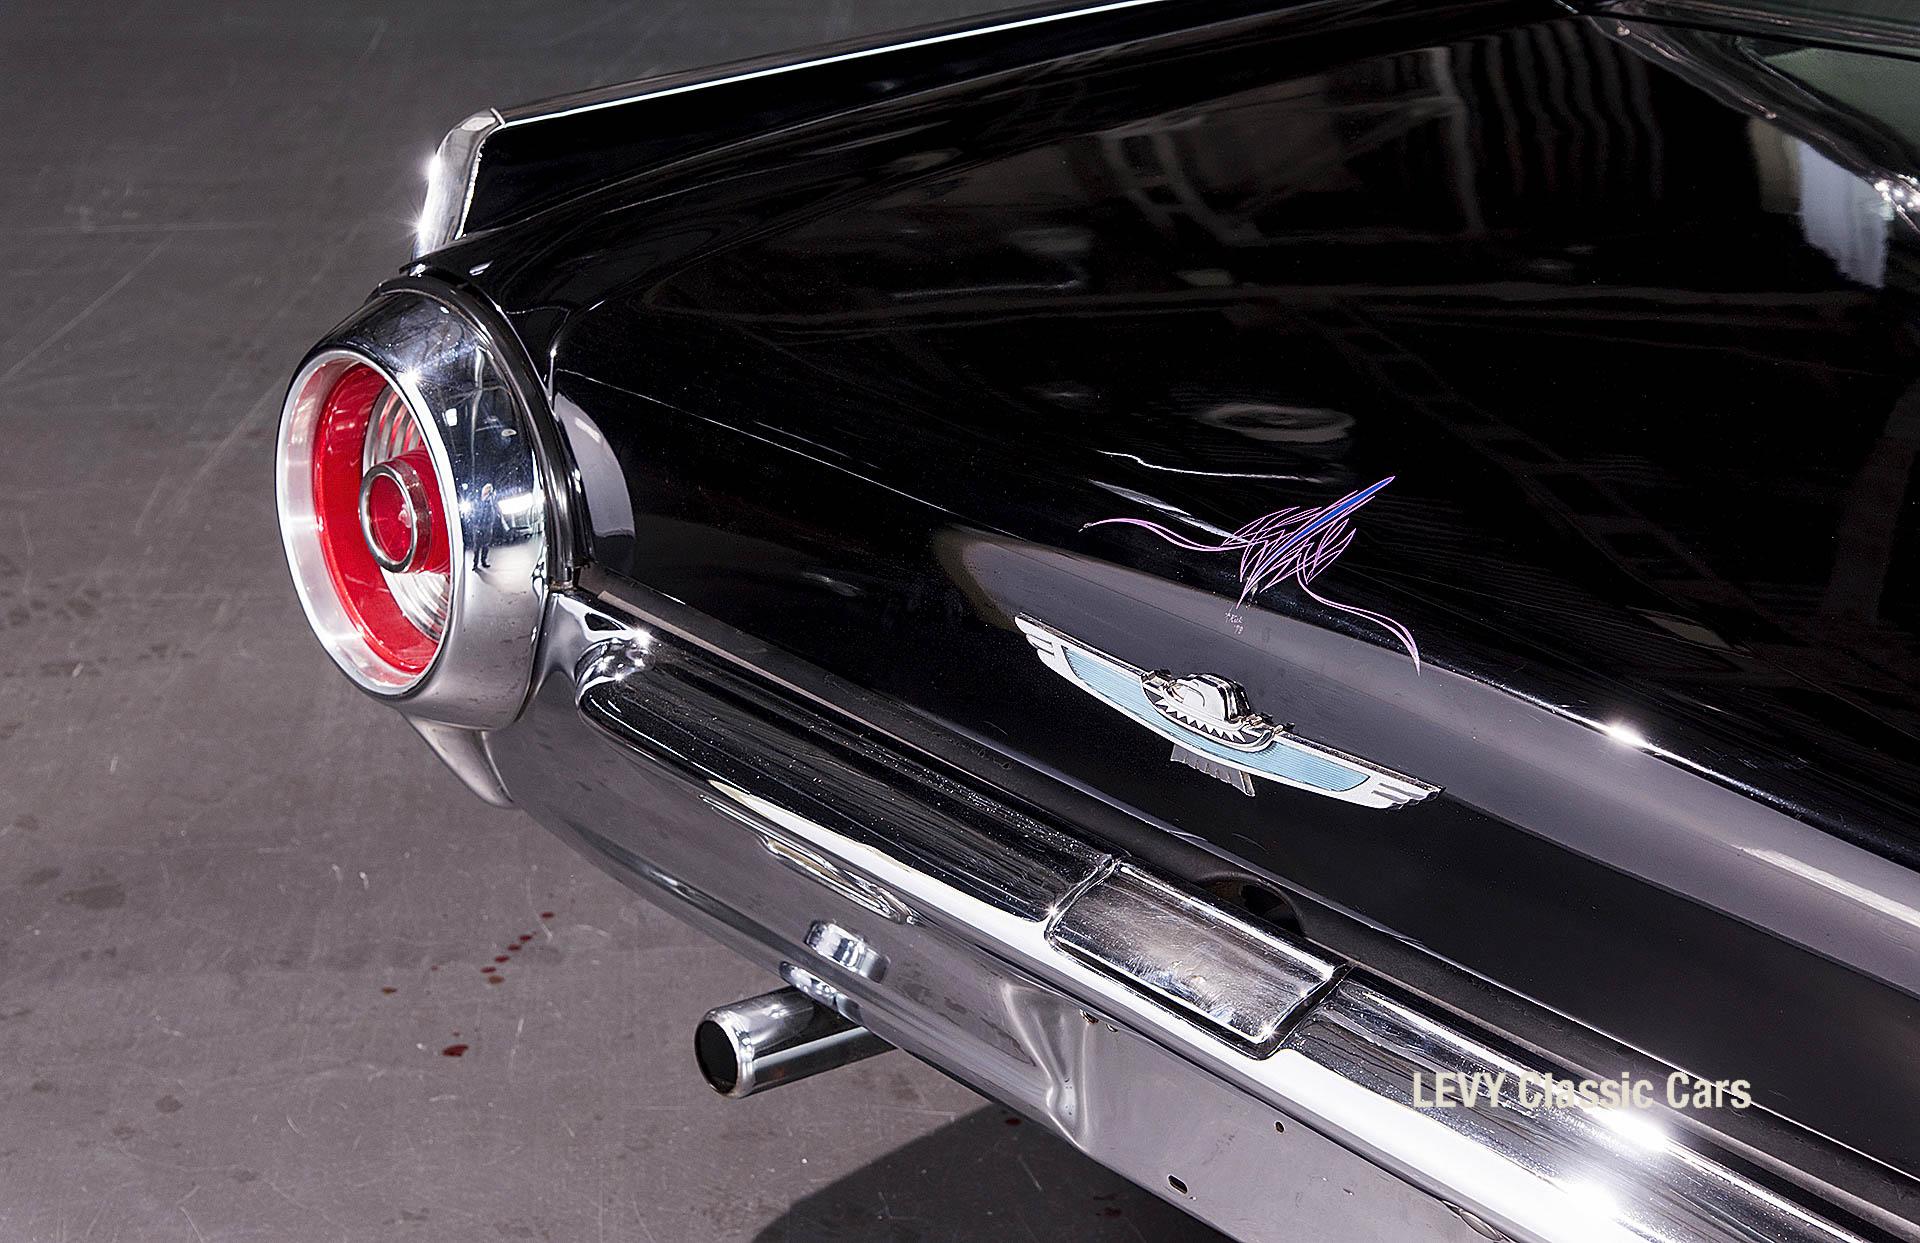 Ford Thunderbird Bullet Bird Coupe 108